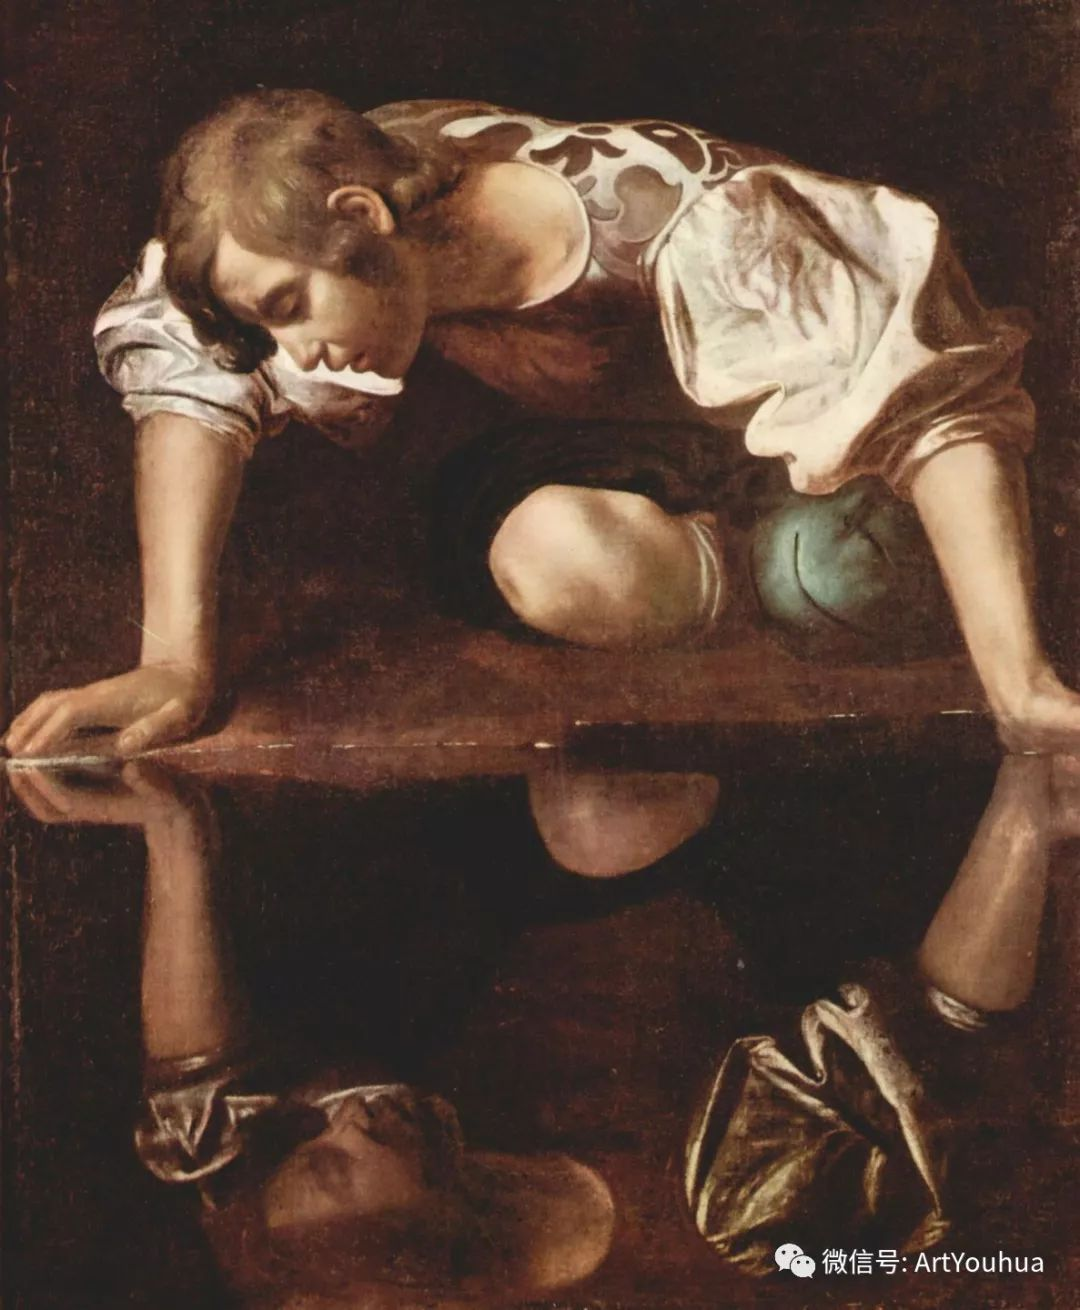 No.18 卡拉瓦乔 | 意大利16世纪末至17世纪初的著名画家插图13